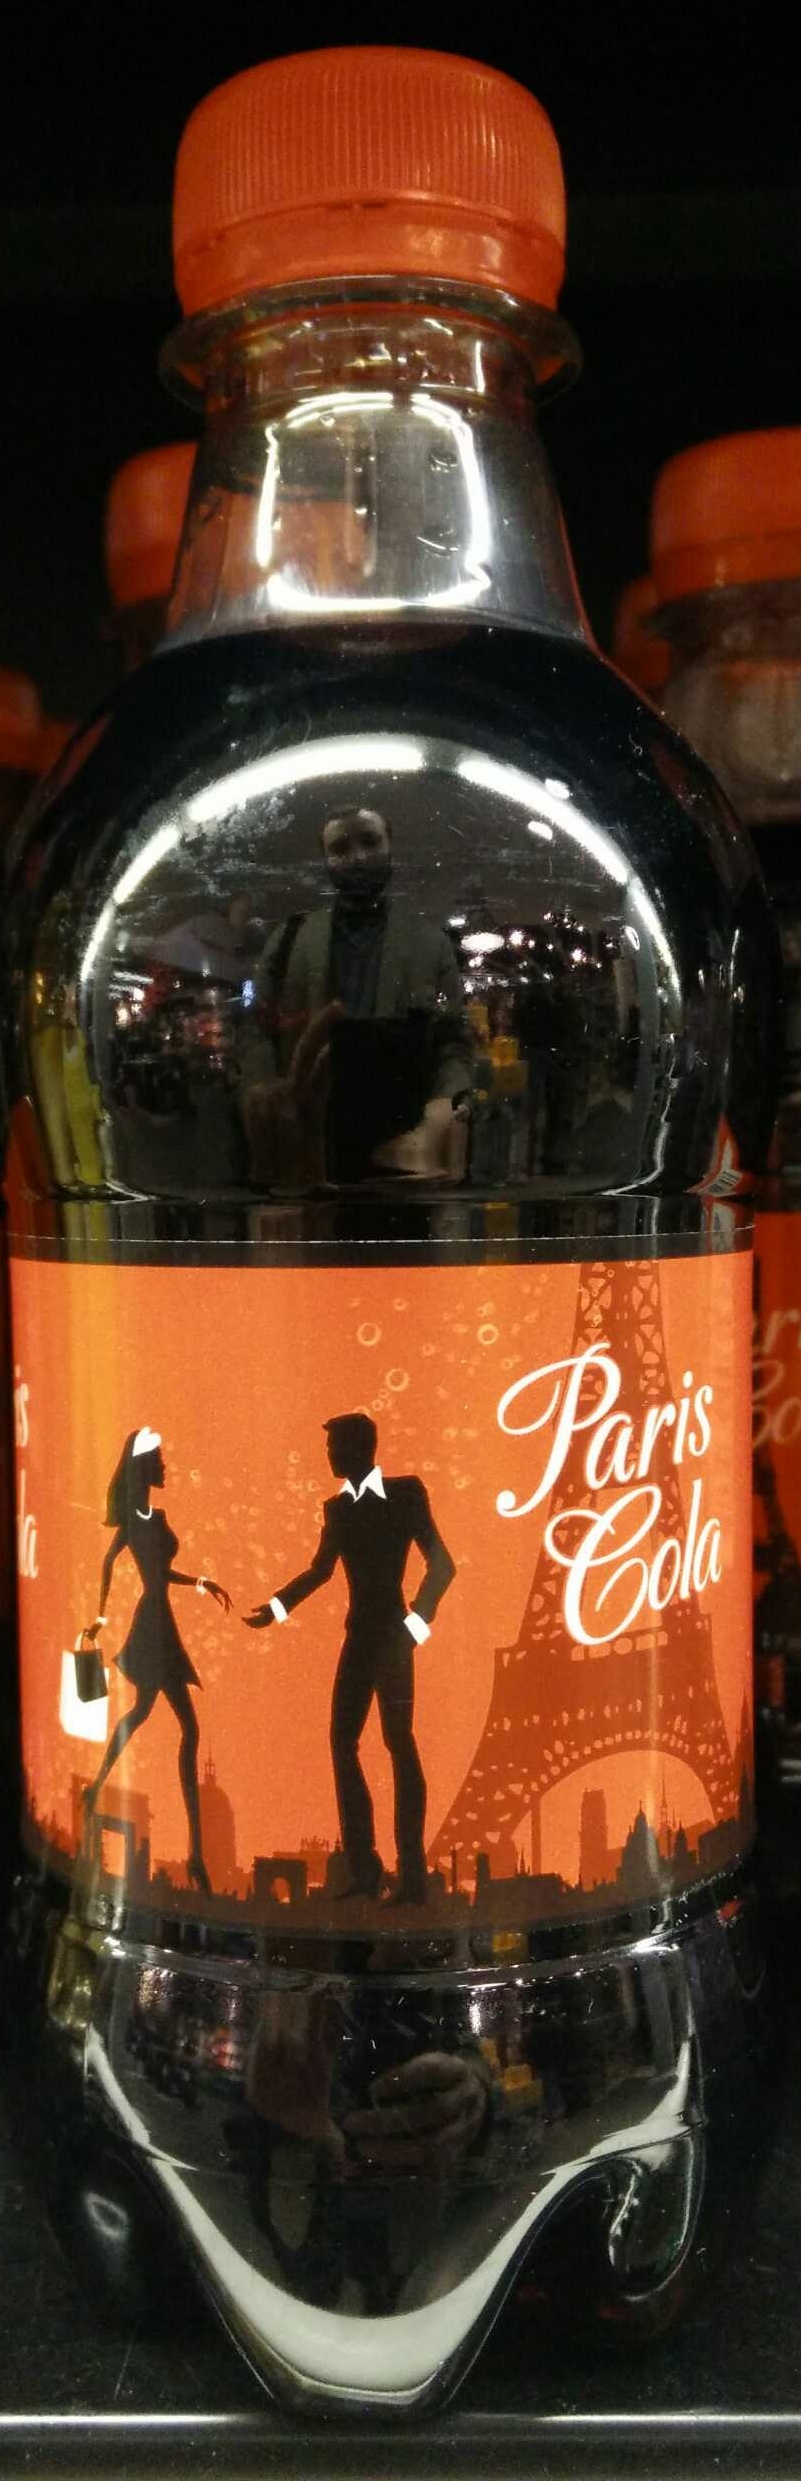 Paris Cola - Prodotto - fr